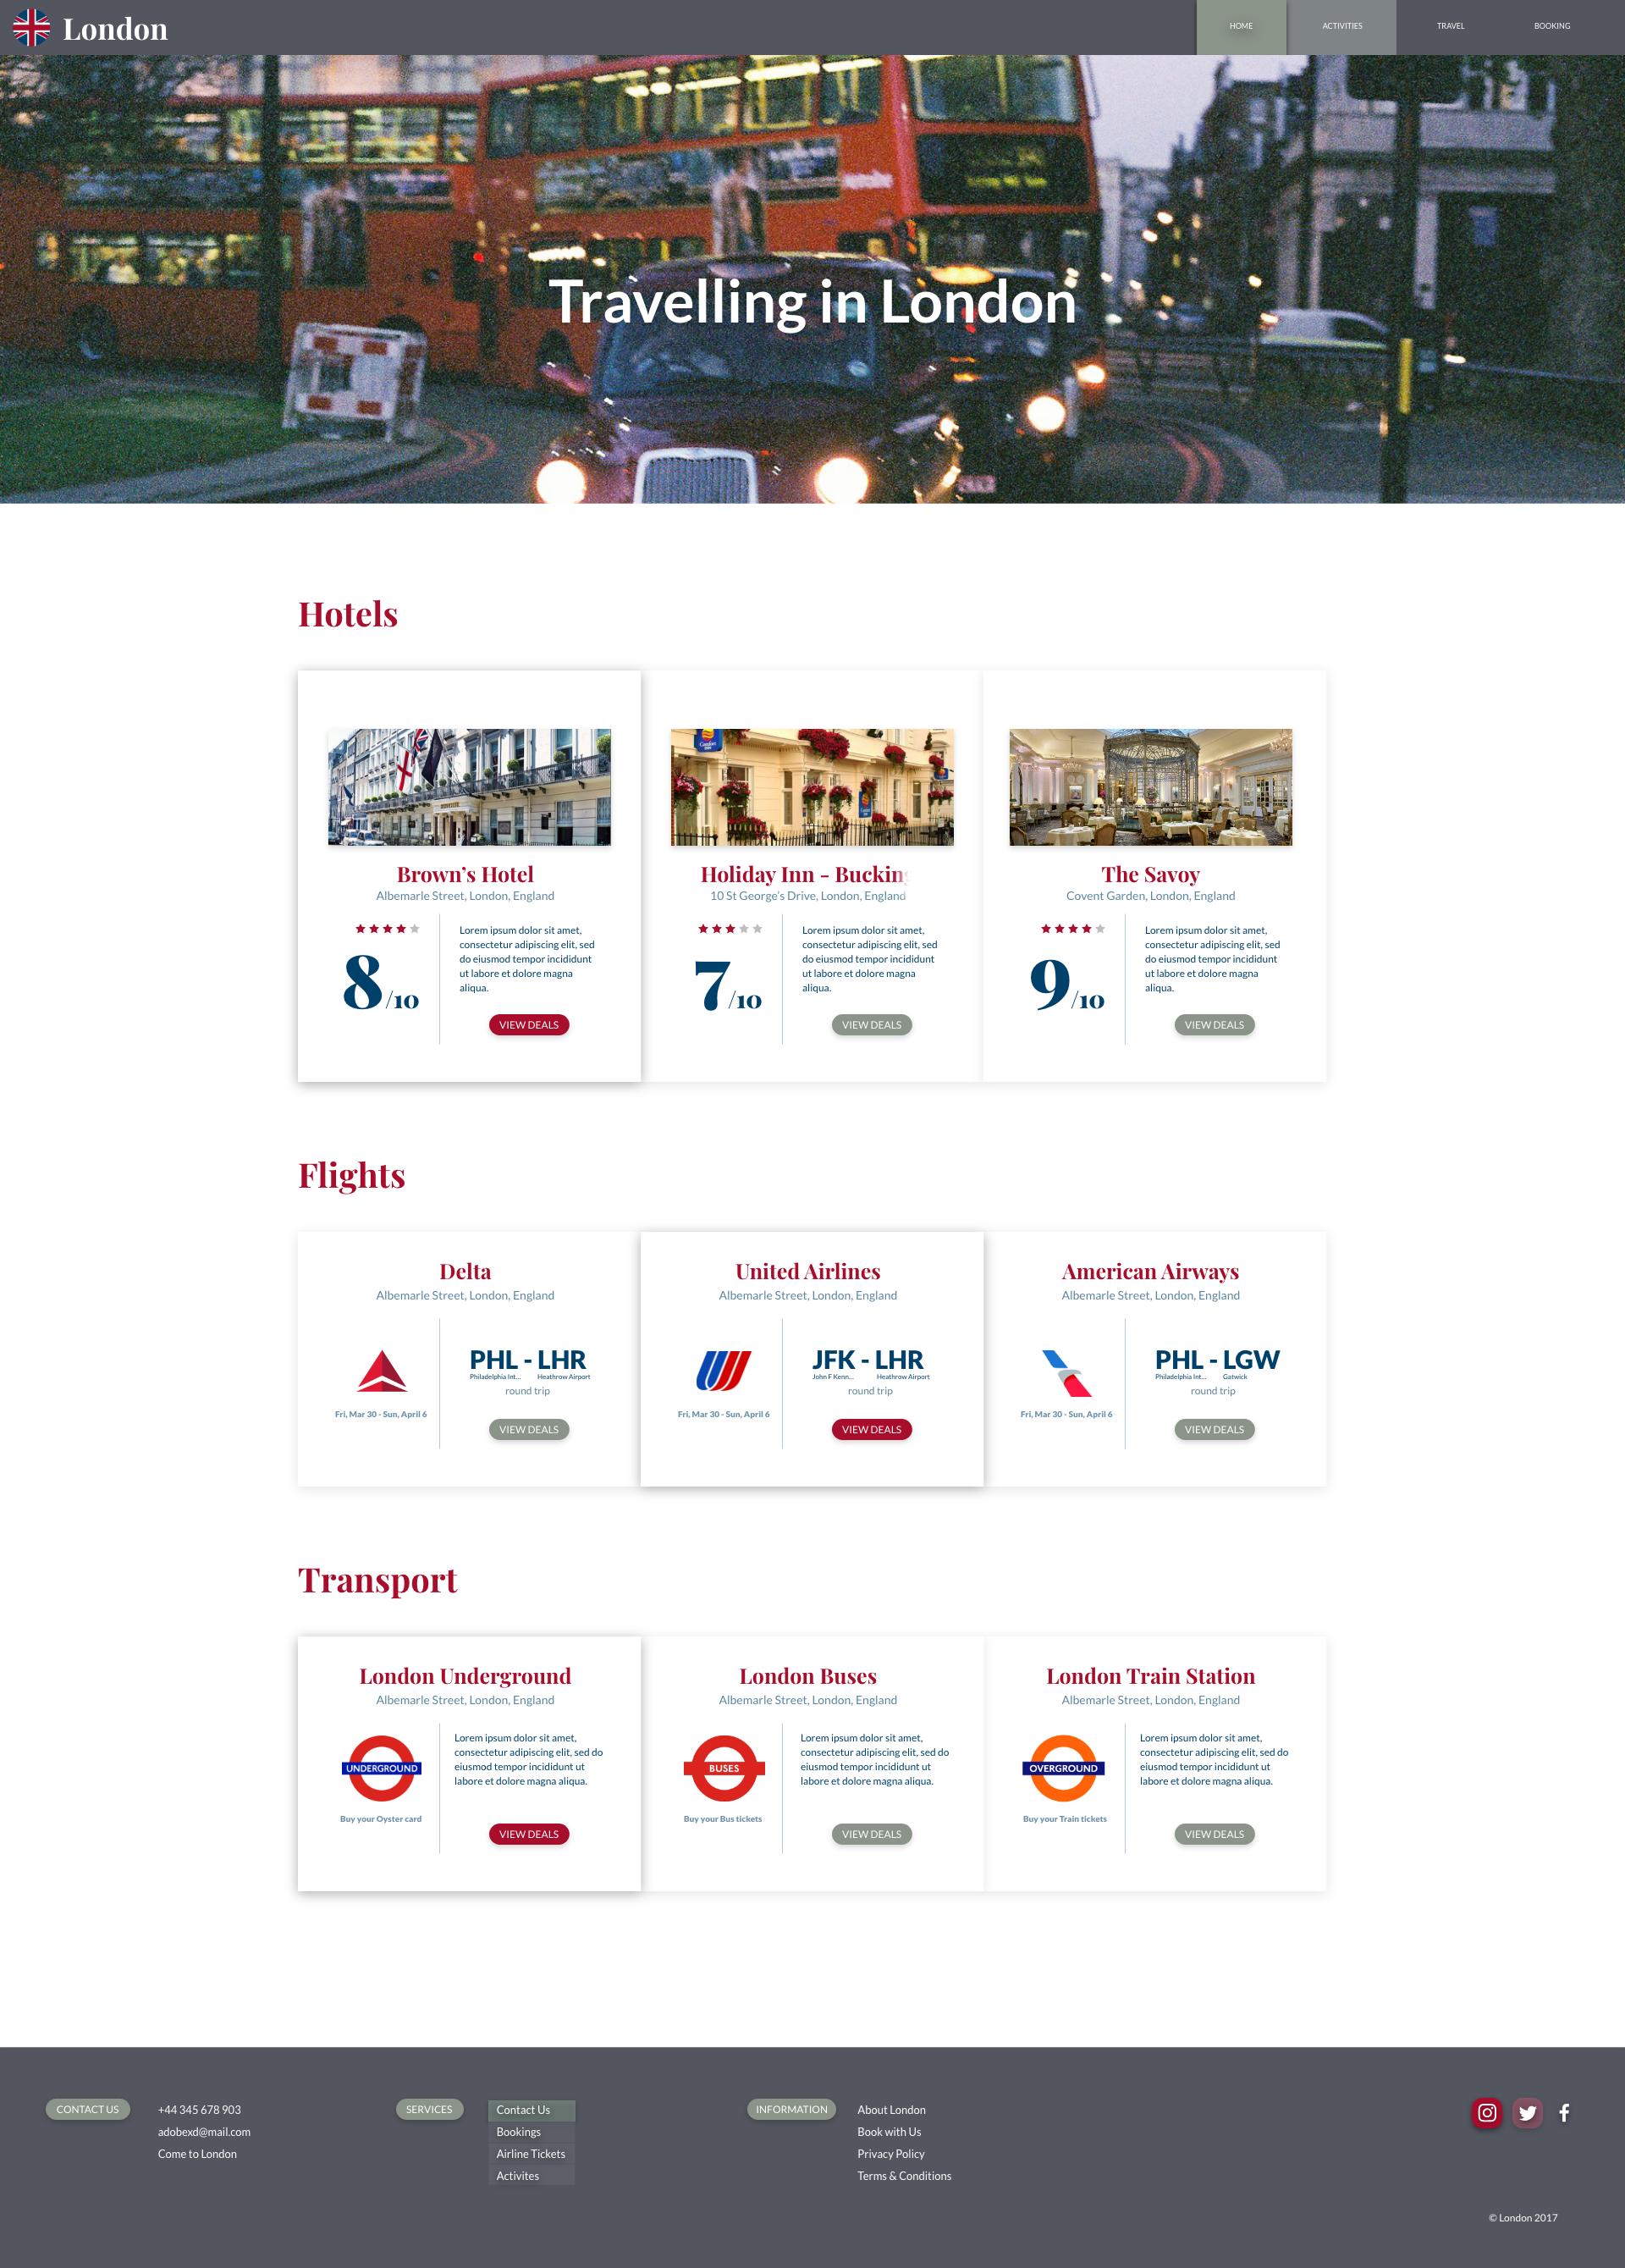 gd217.e.phillips.travel-deals-design-1